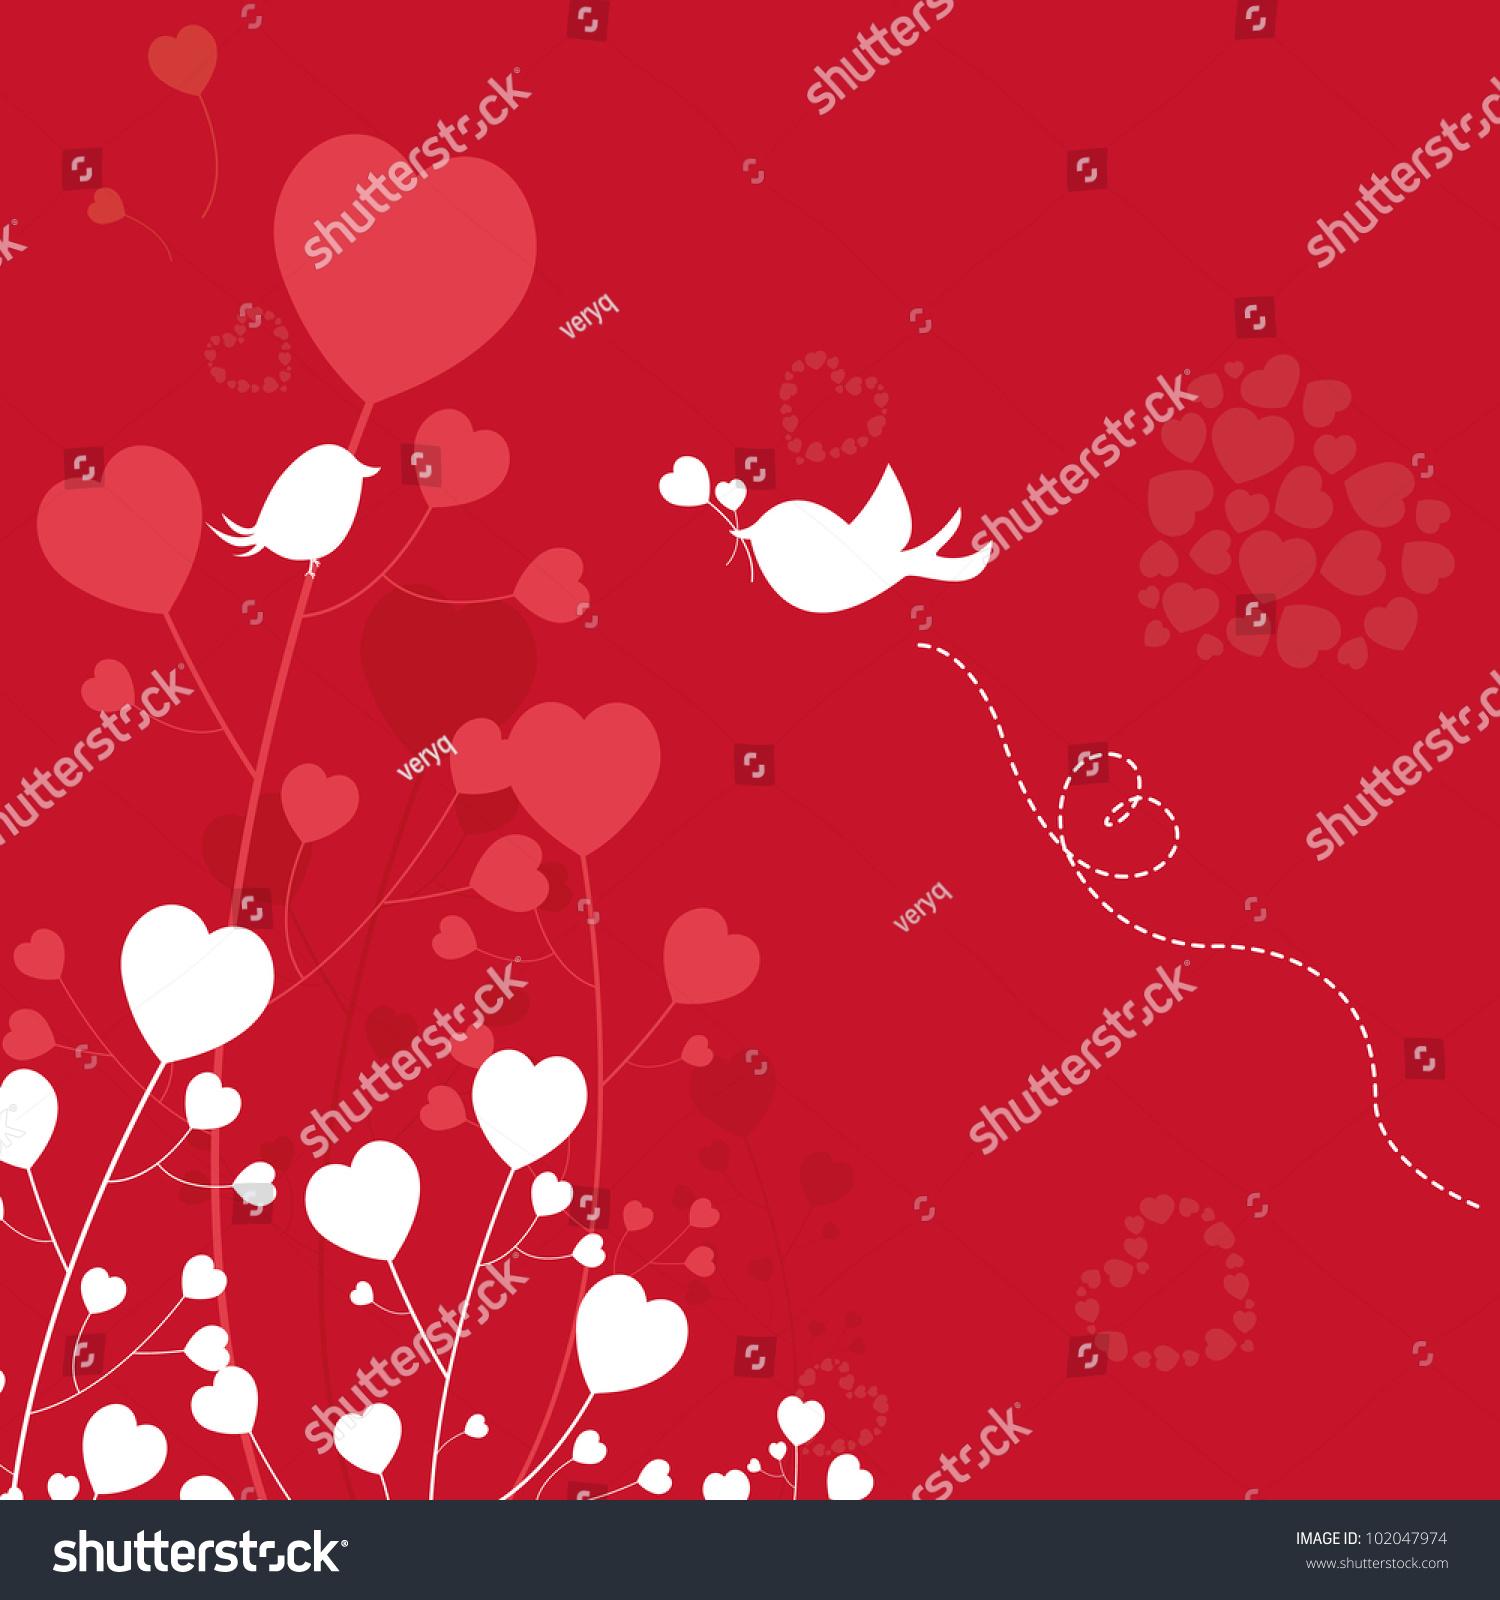 love bird dating site